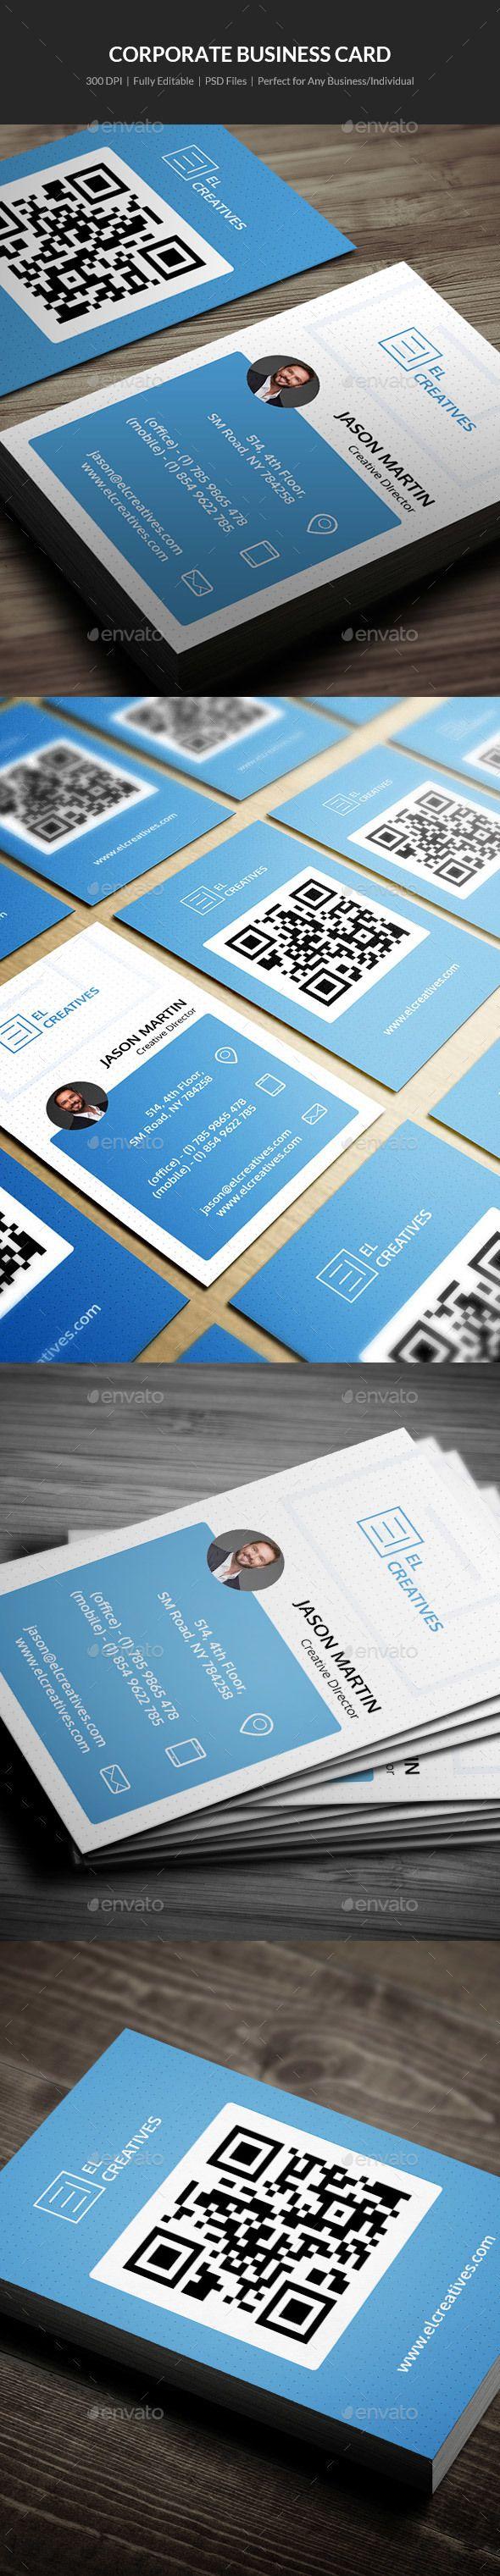 Corporate Business Card 04 Corporate Business Card Business Cards Business Card Template Psd